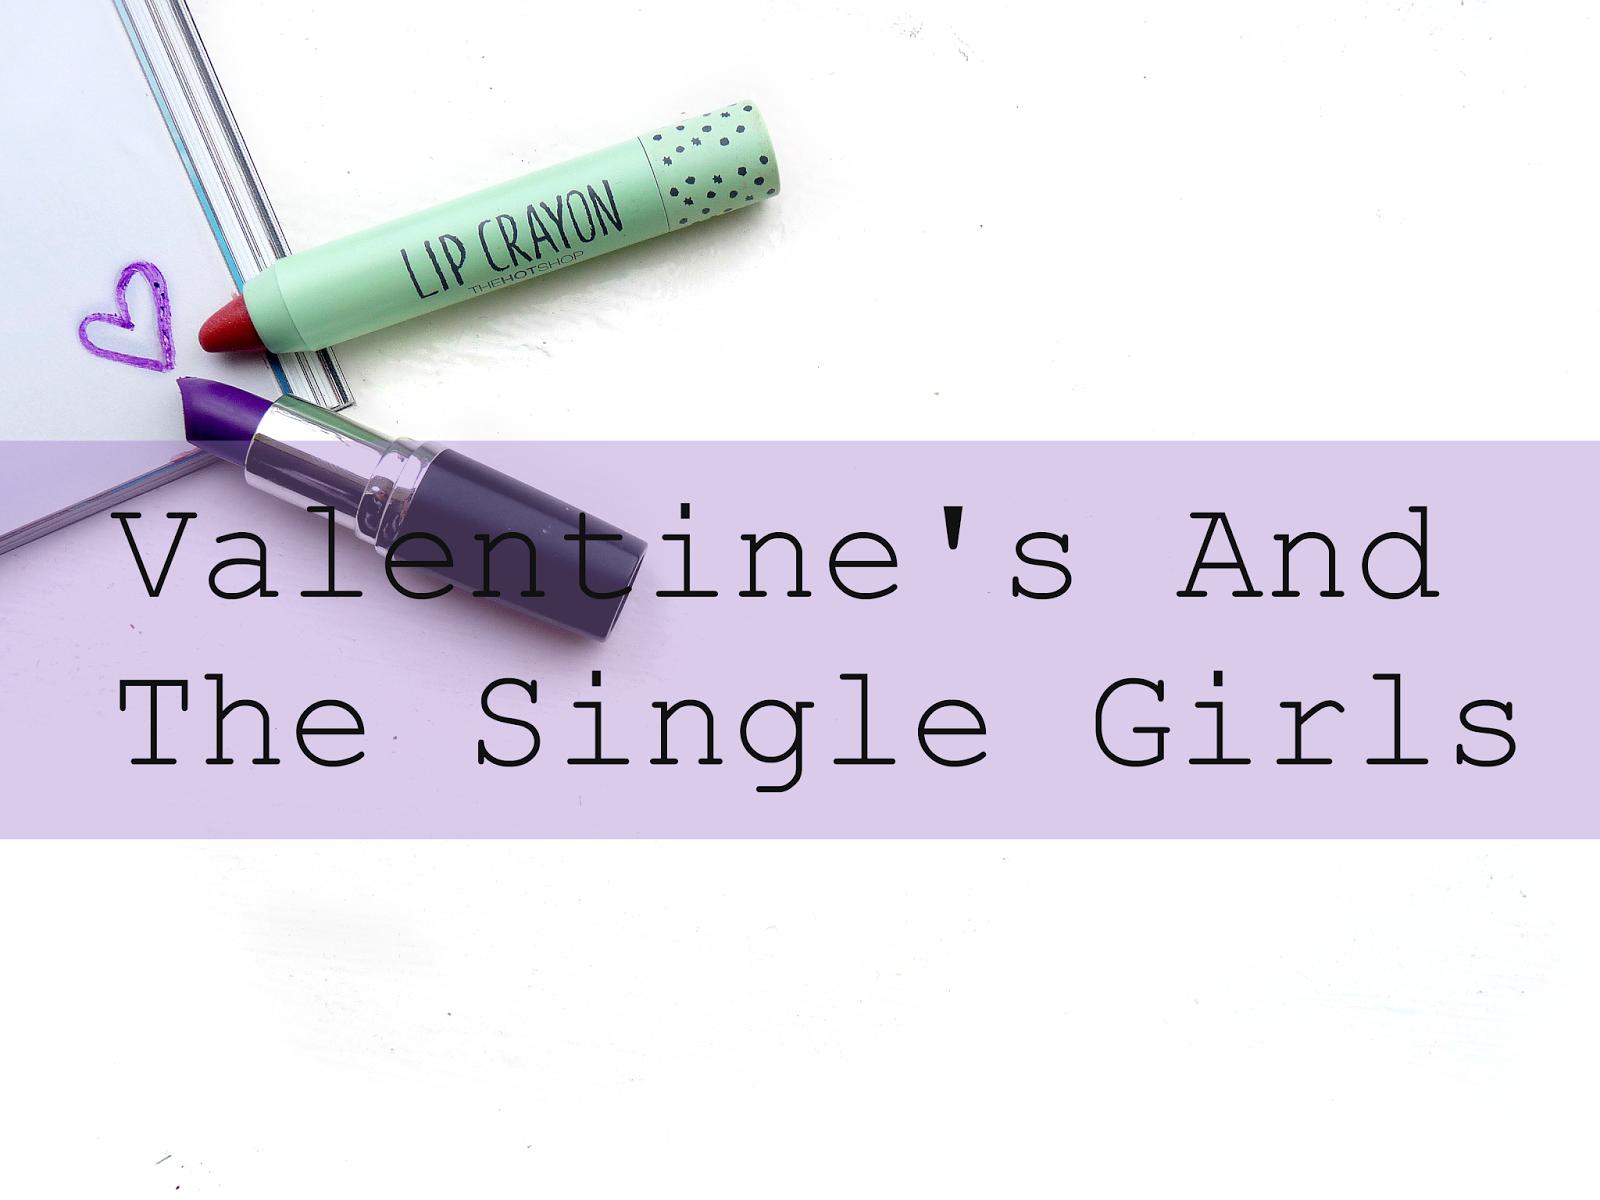 Valentines day single girls girl